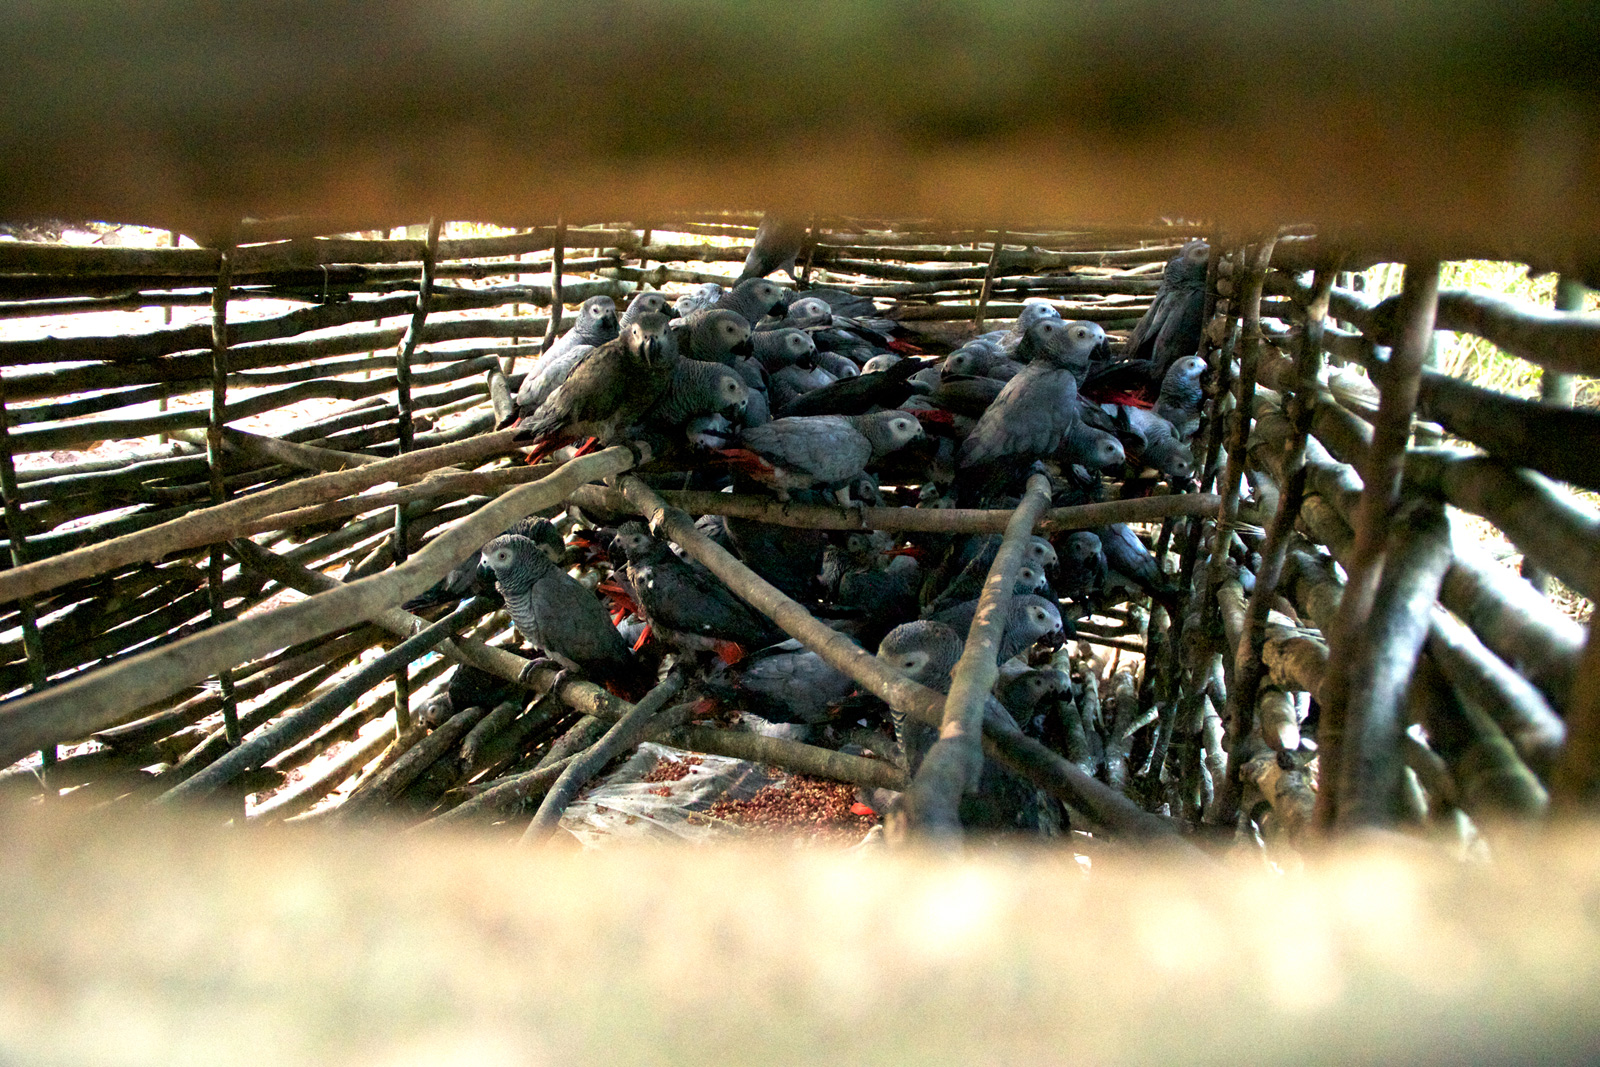 grey-parrots-captured-shades-of-grey